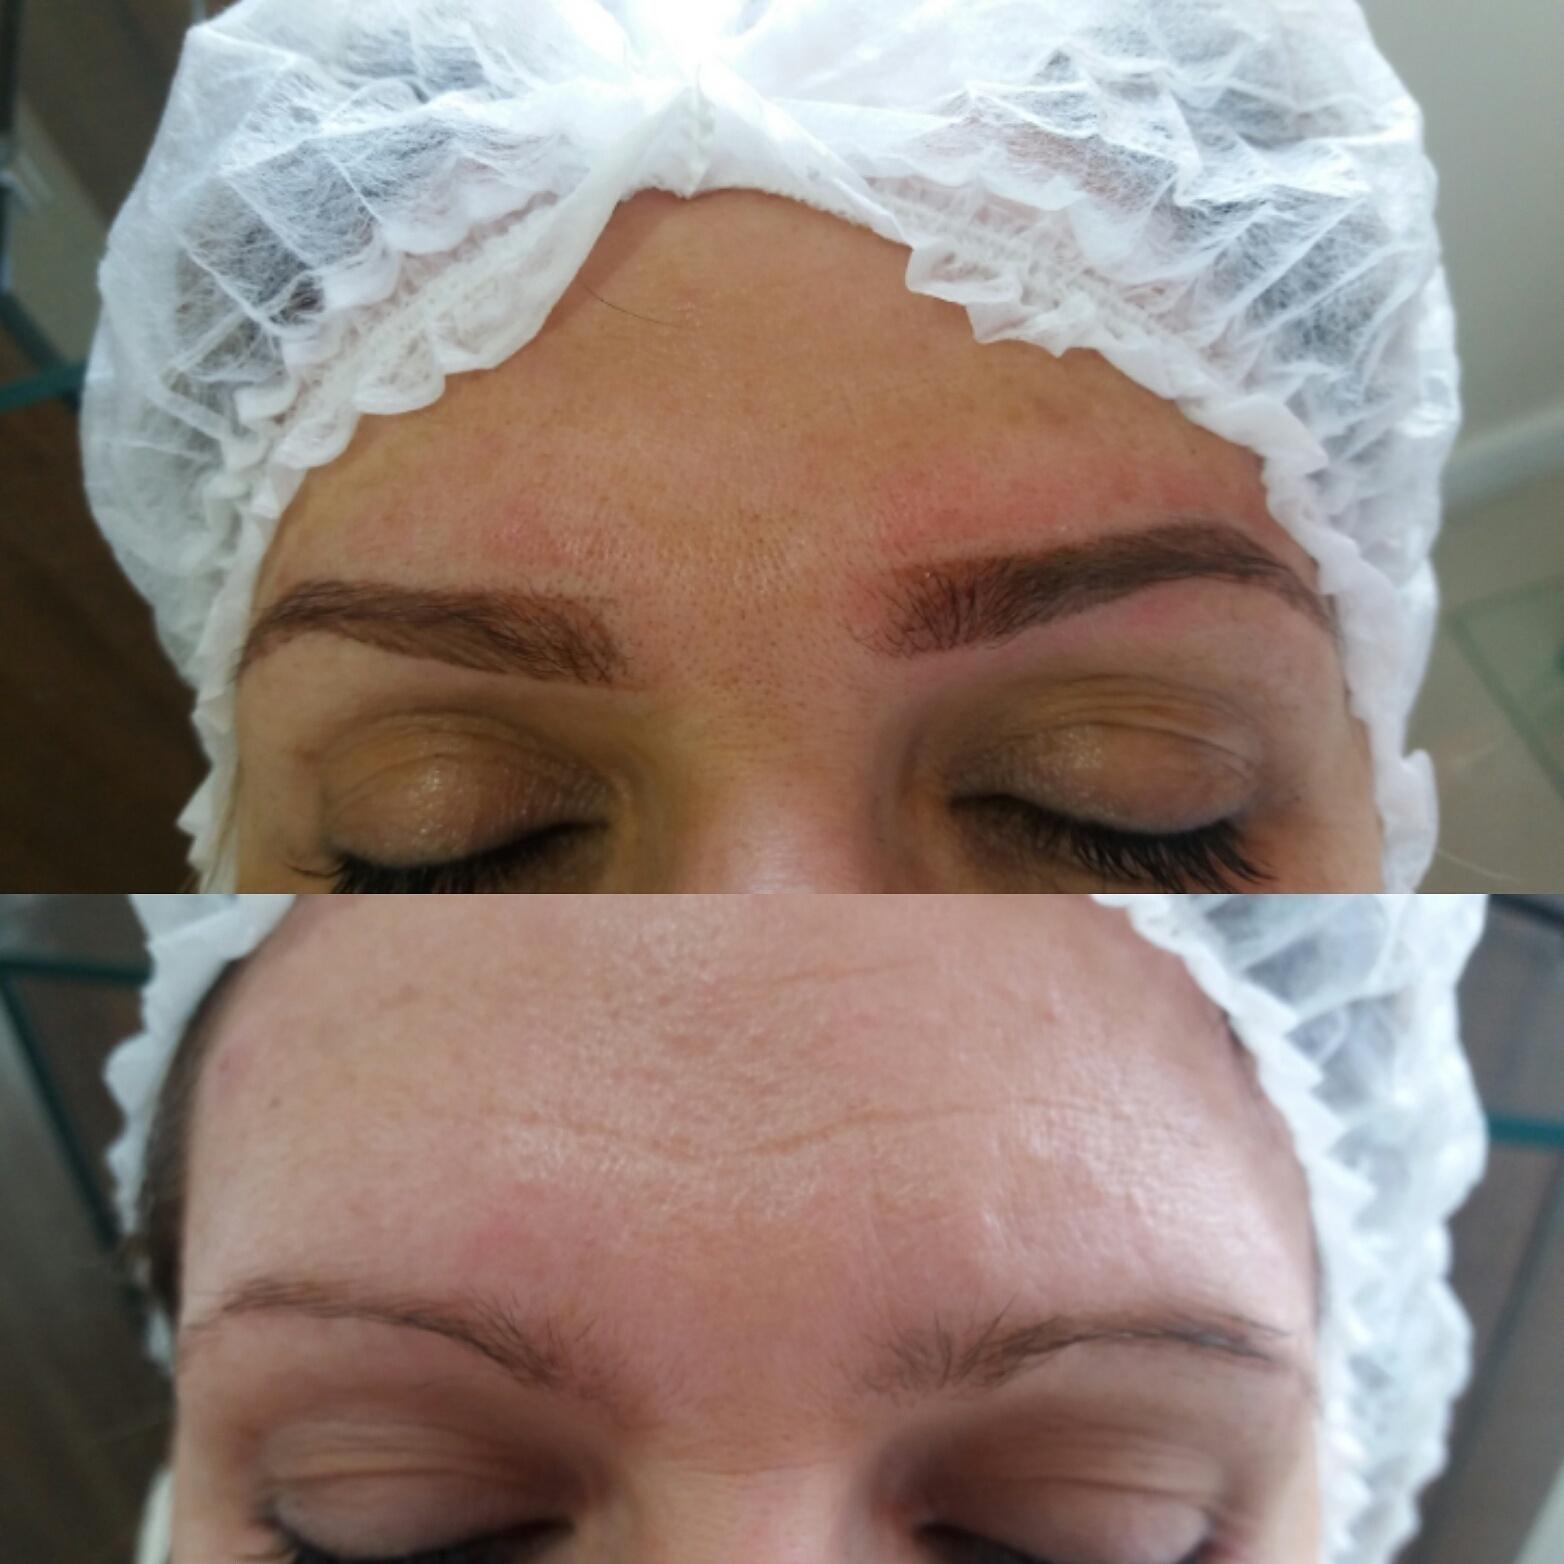 micropigmentação  estética esteticista docente / professor(a) manicure e pedicure maquiador(a) micropigmentador(a) cosmetólogo(a) aromaterapeuta